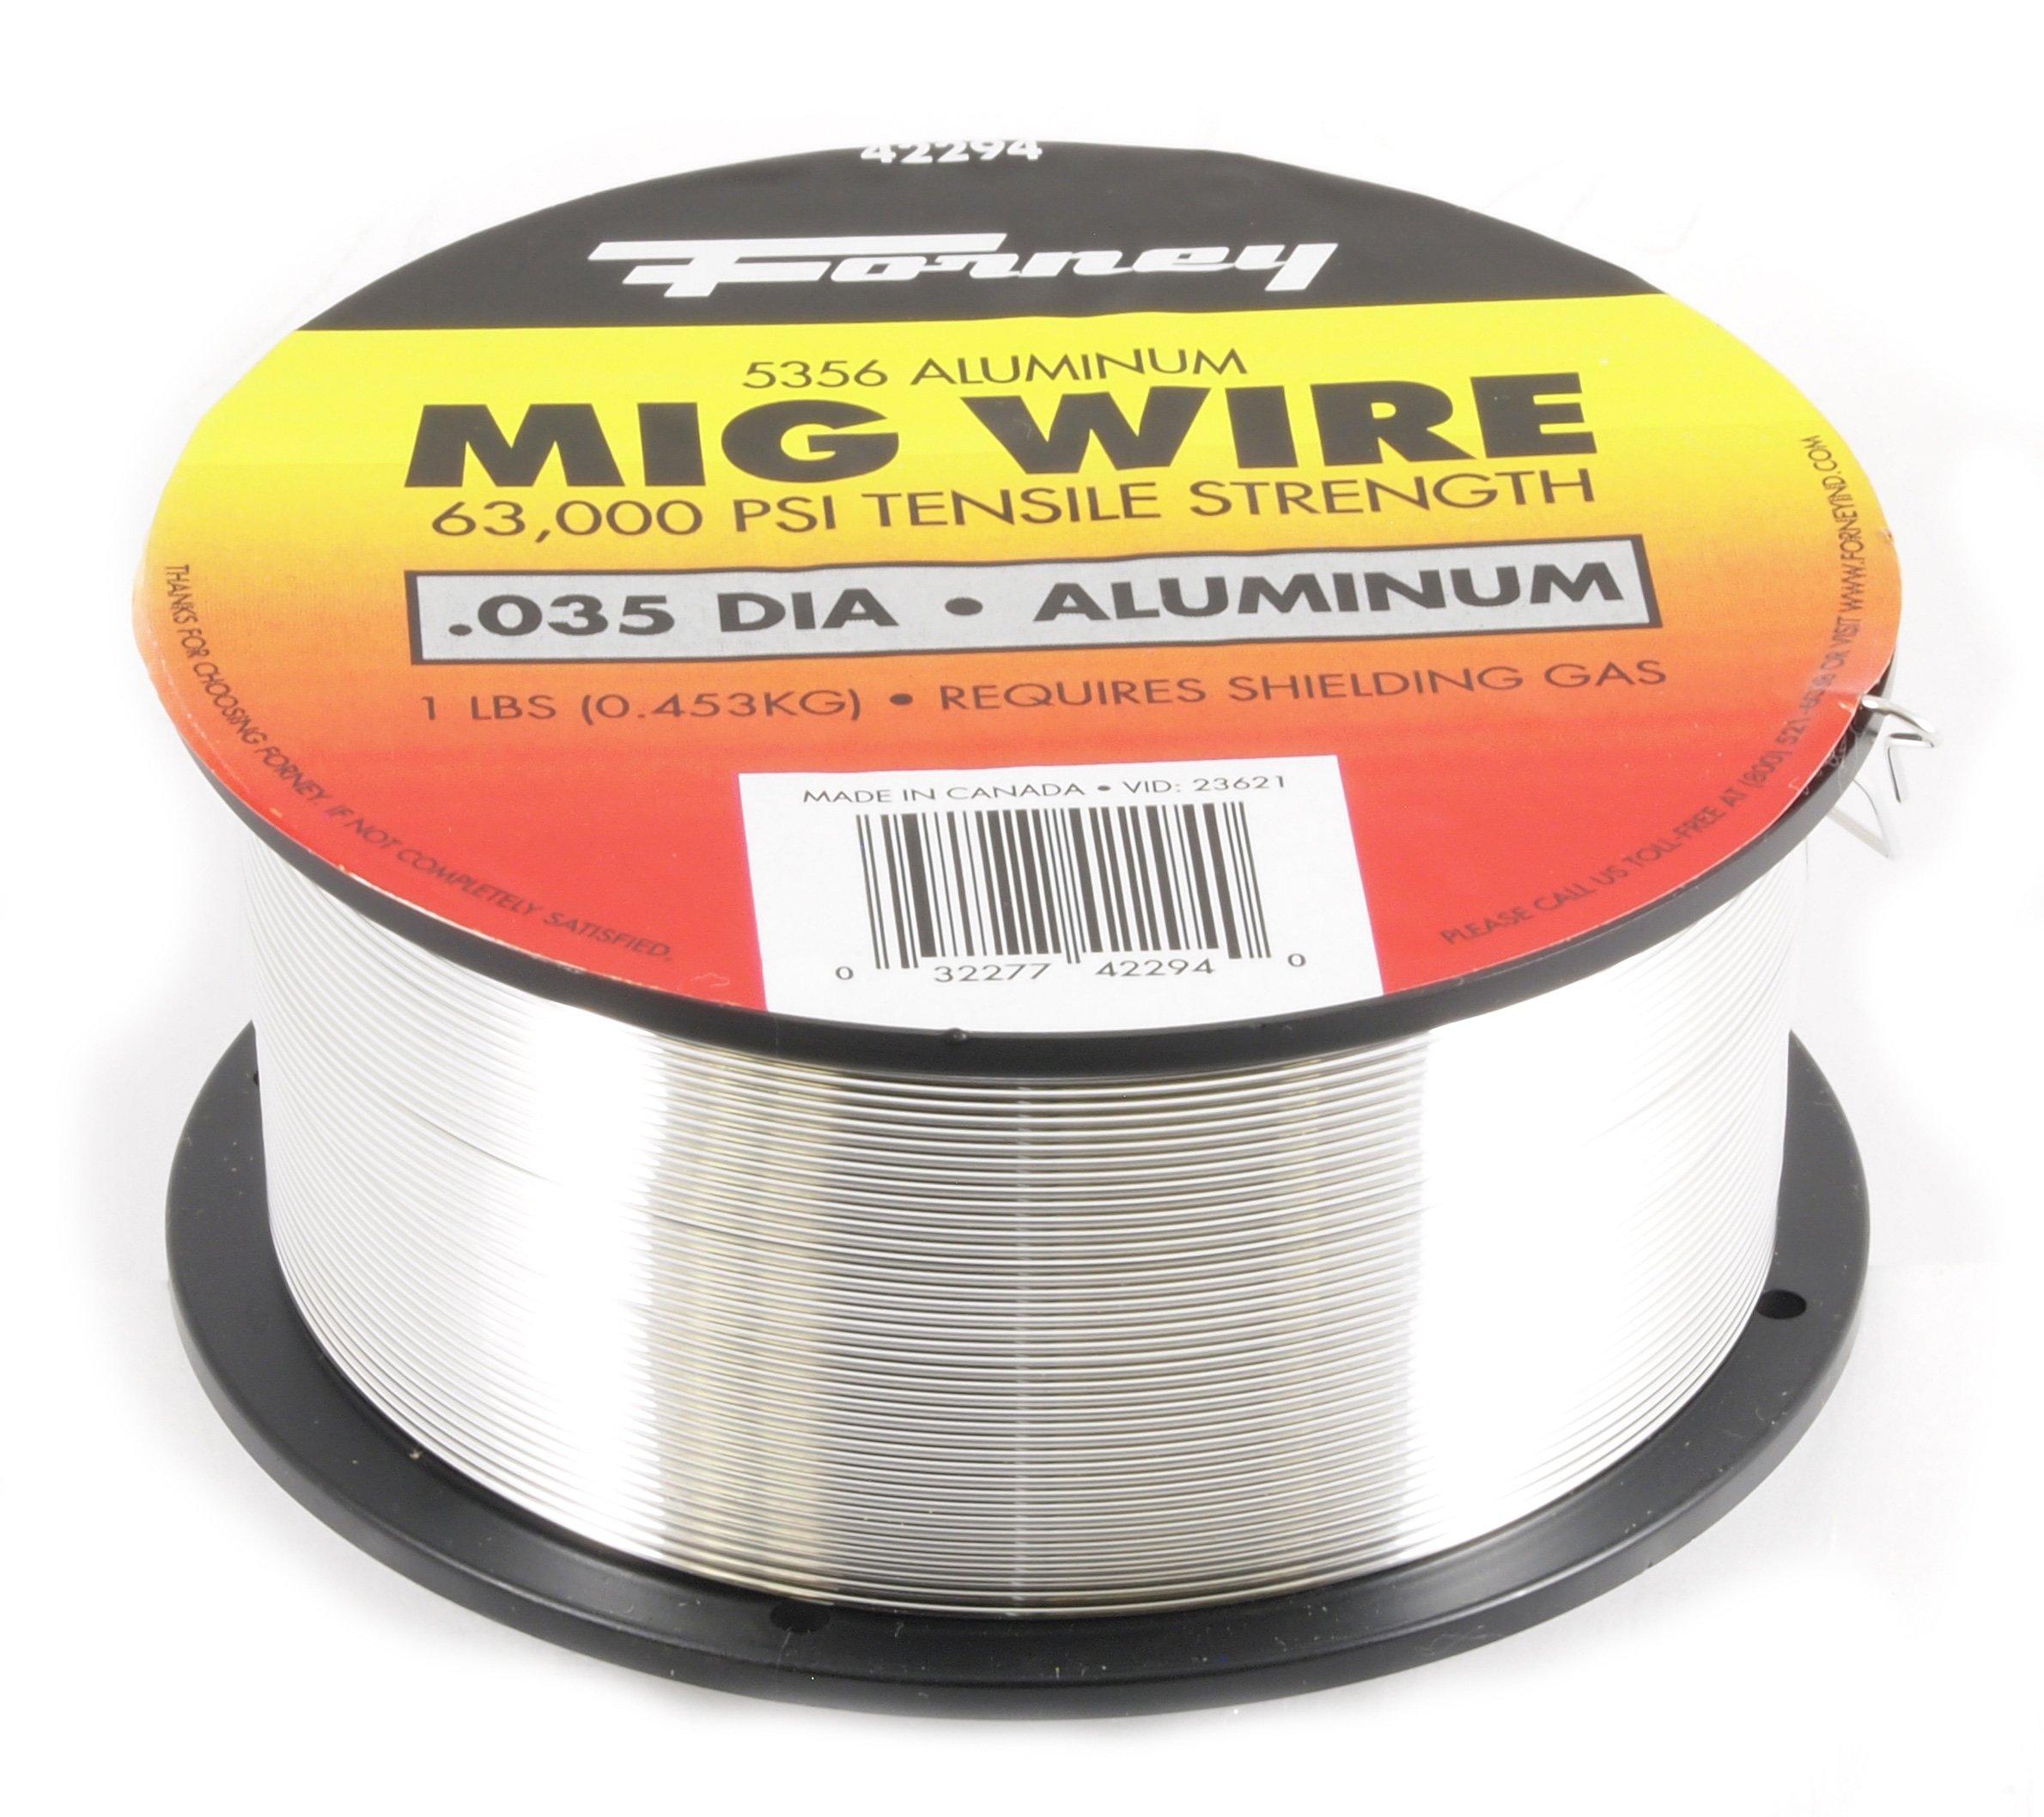 Forney 42294 Mig Wire, Aluminum Alloy ER5356.035-Diameter, 1-Pound Spool